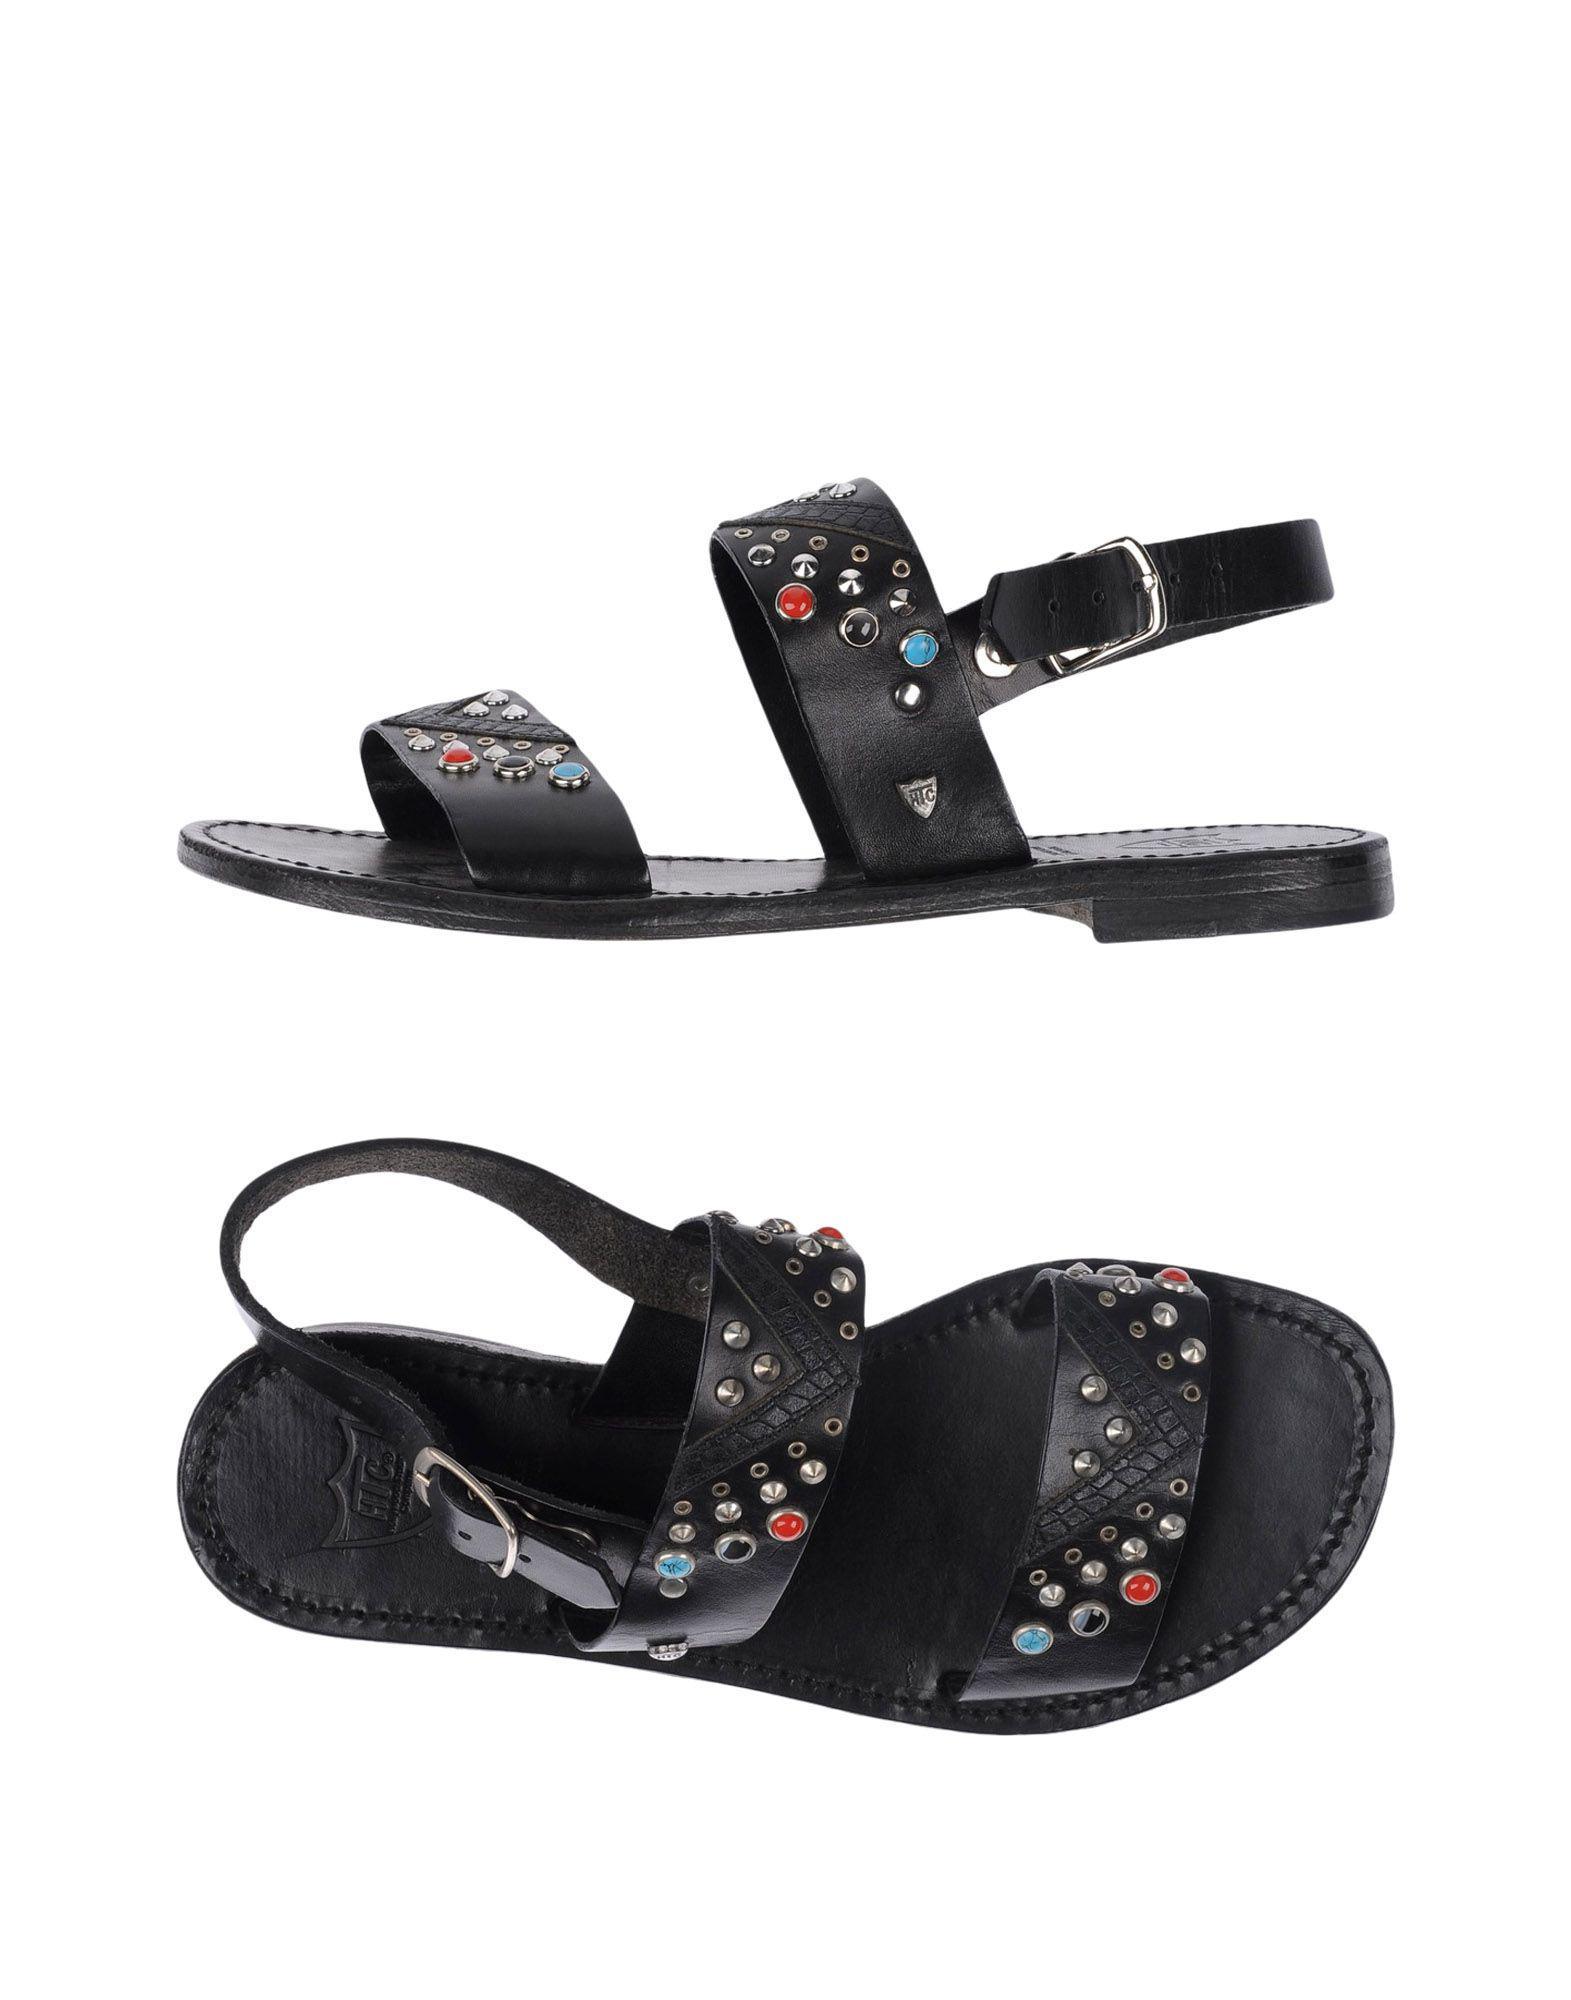 FOOTWEAR - Sandals HTC 2dbk94